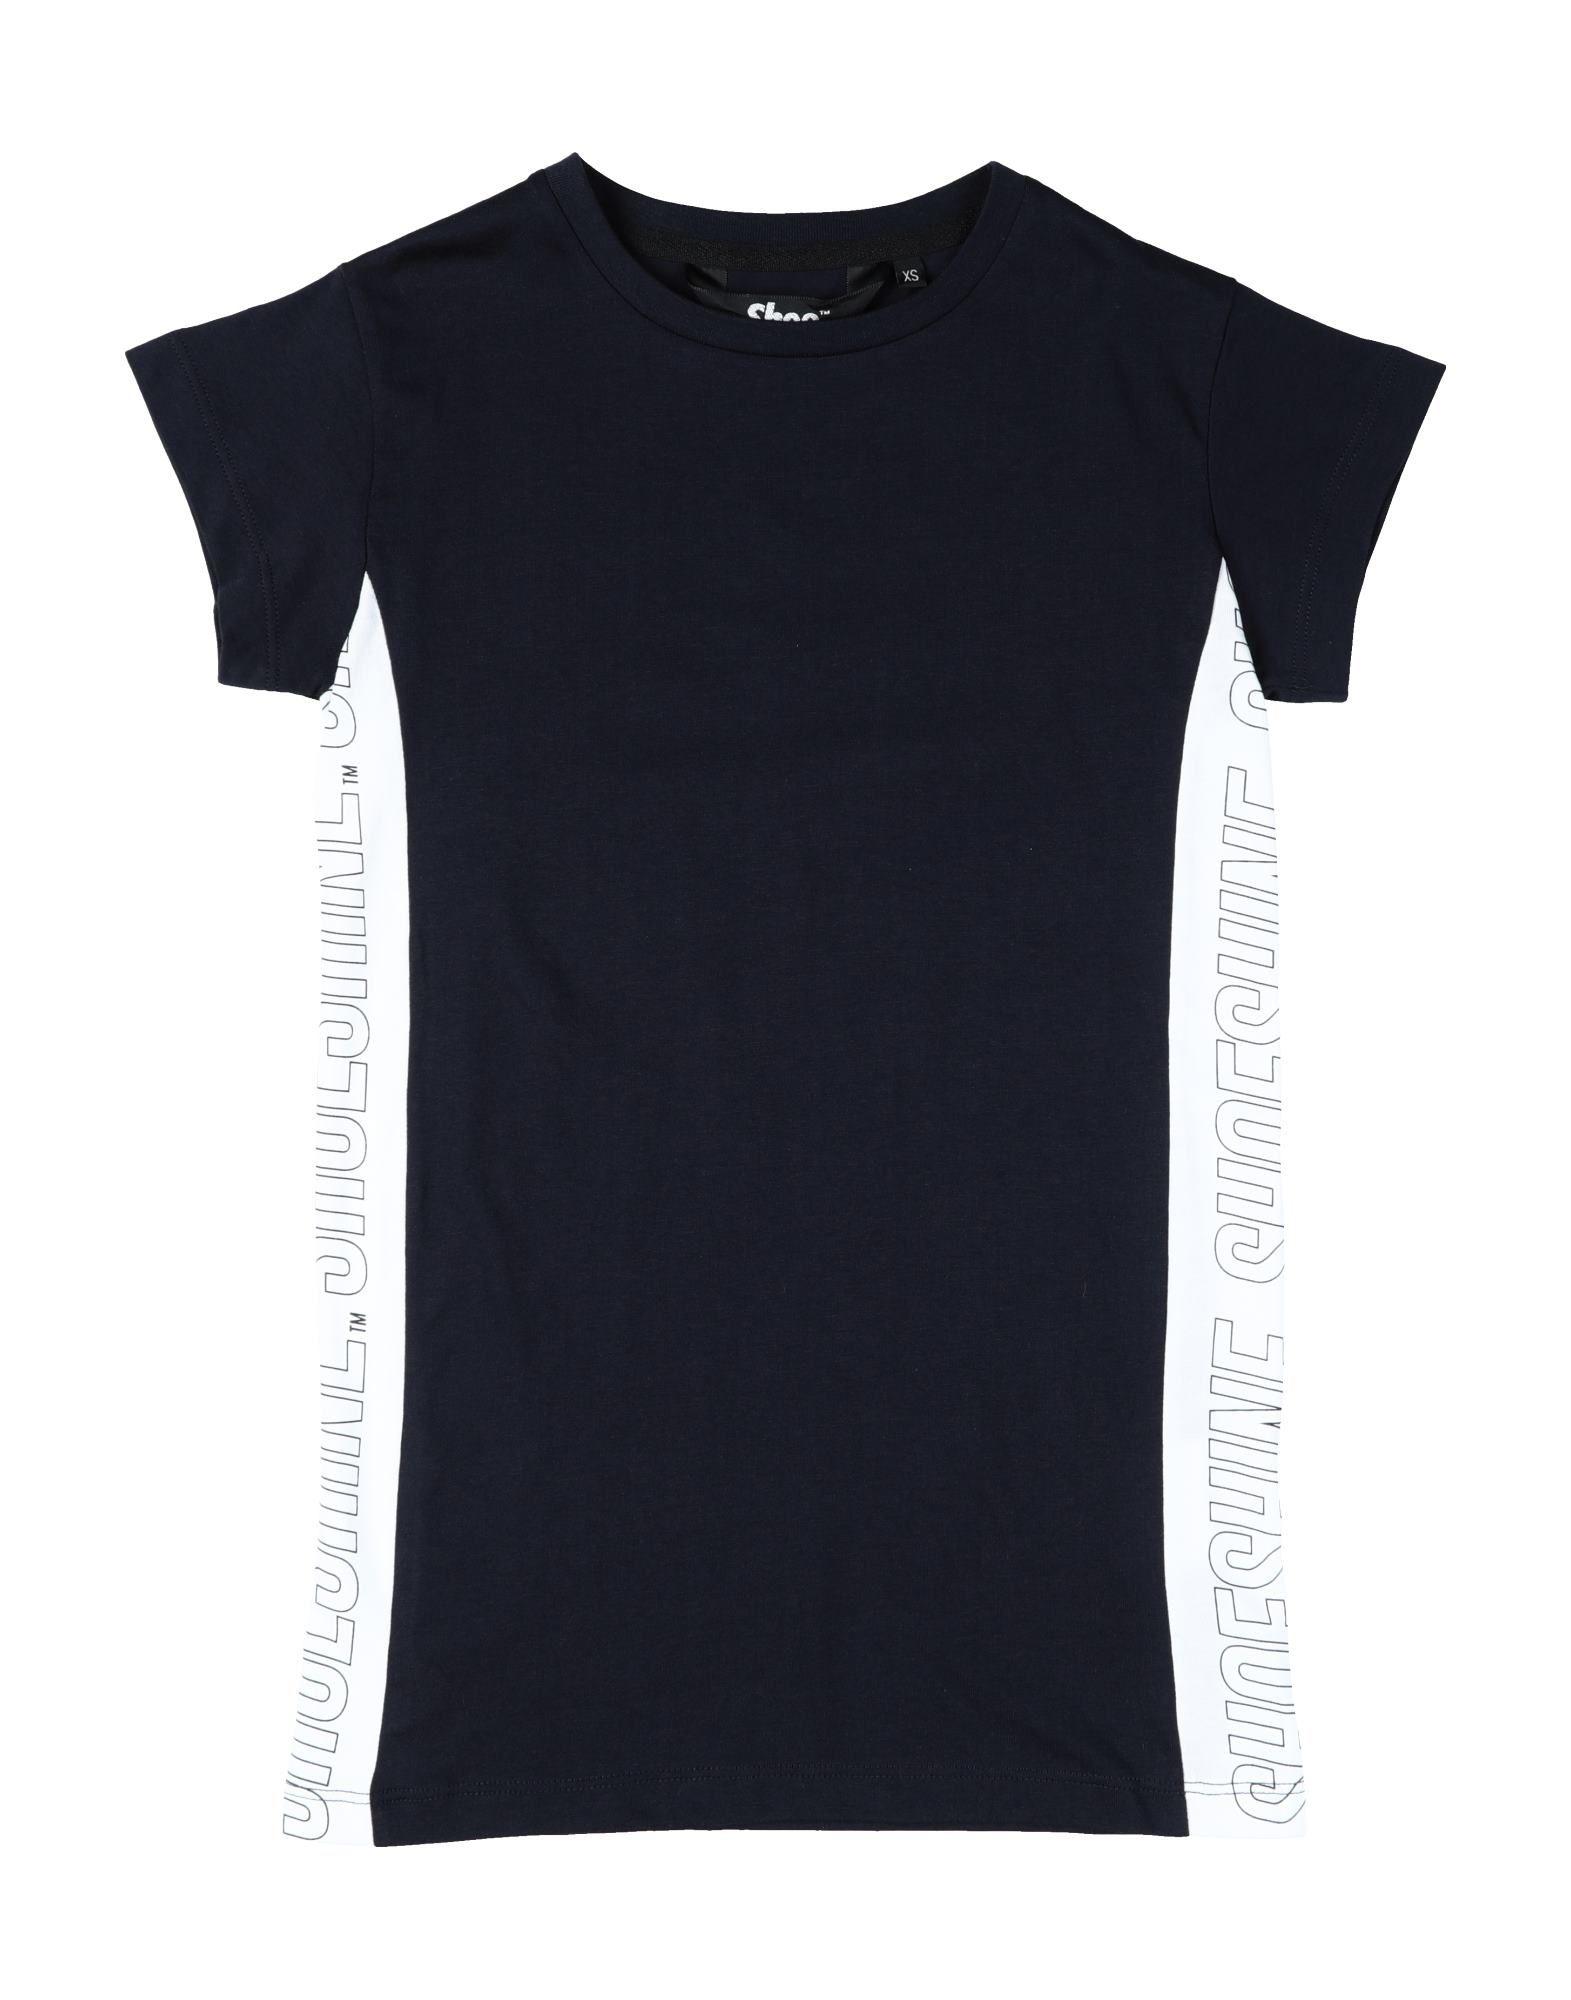 Shoeshine Kids' T-shirts In Blue